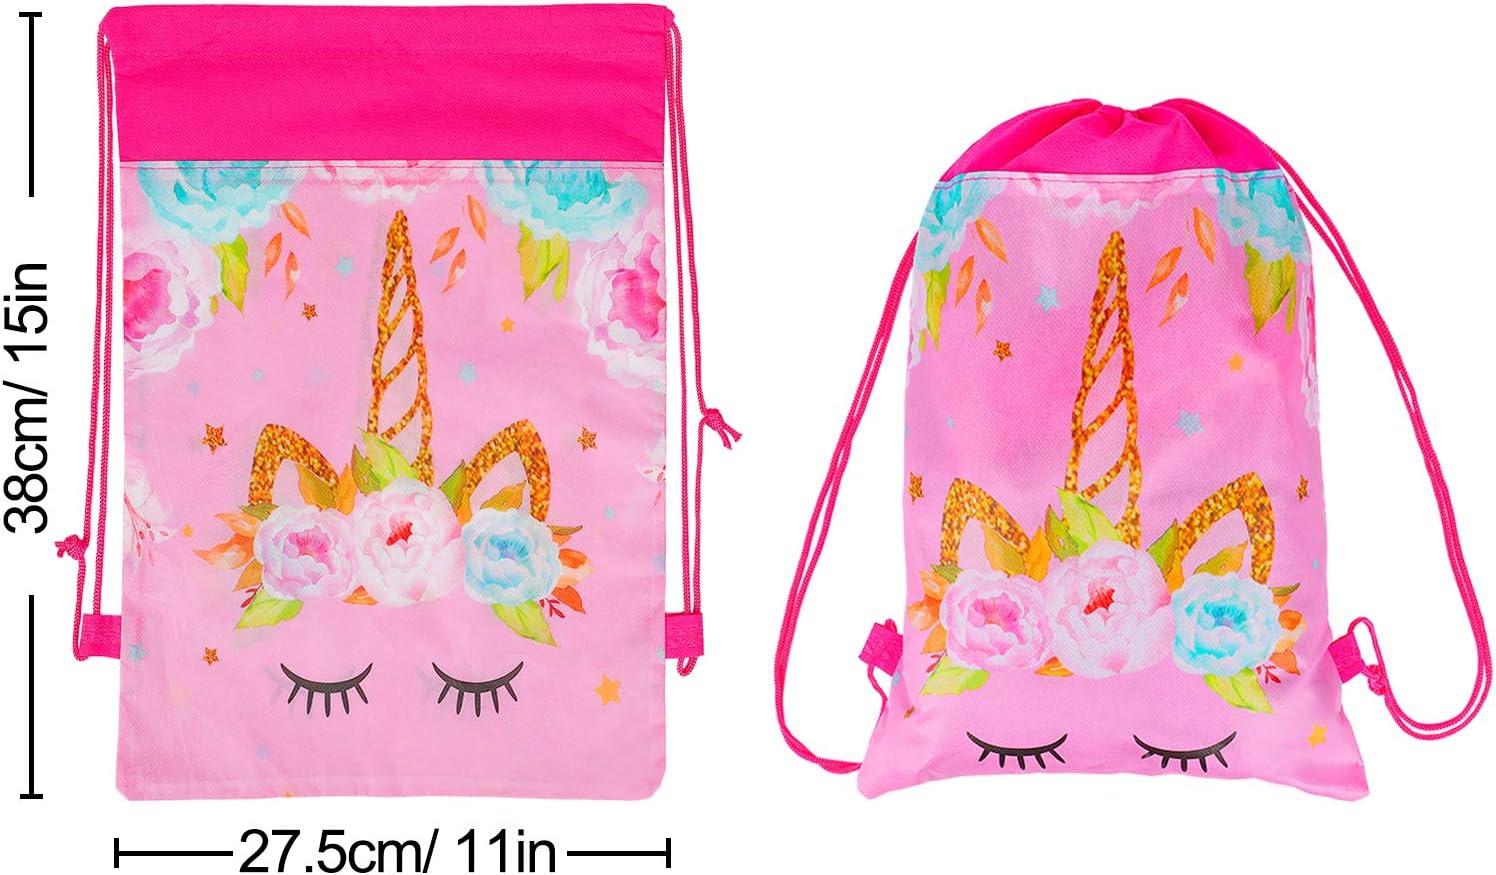 Amazon.com: Bolsas de fiesta con cordón de unicornio, color ...